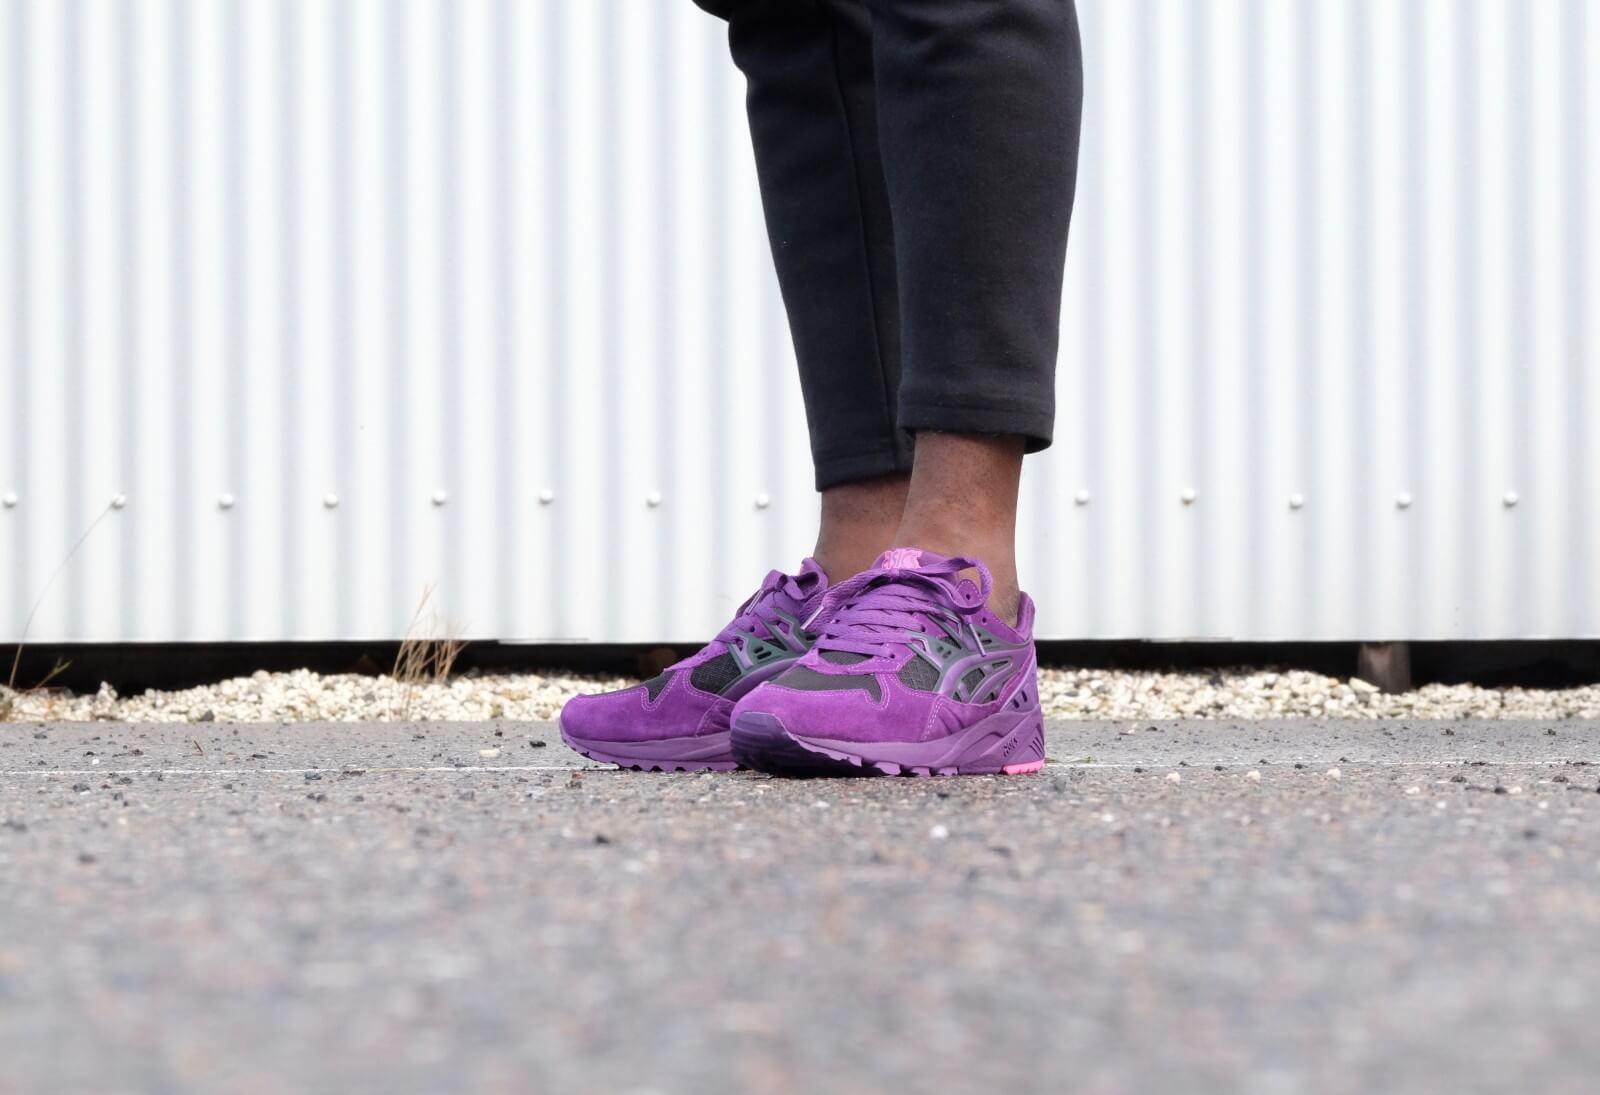 Asics Gel Kayano Trainer - Purple